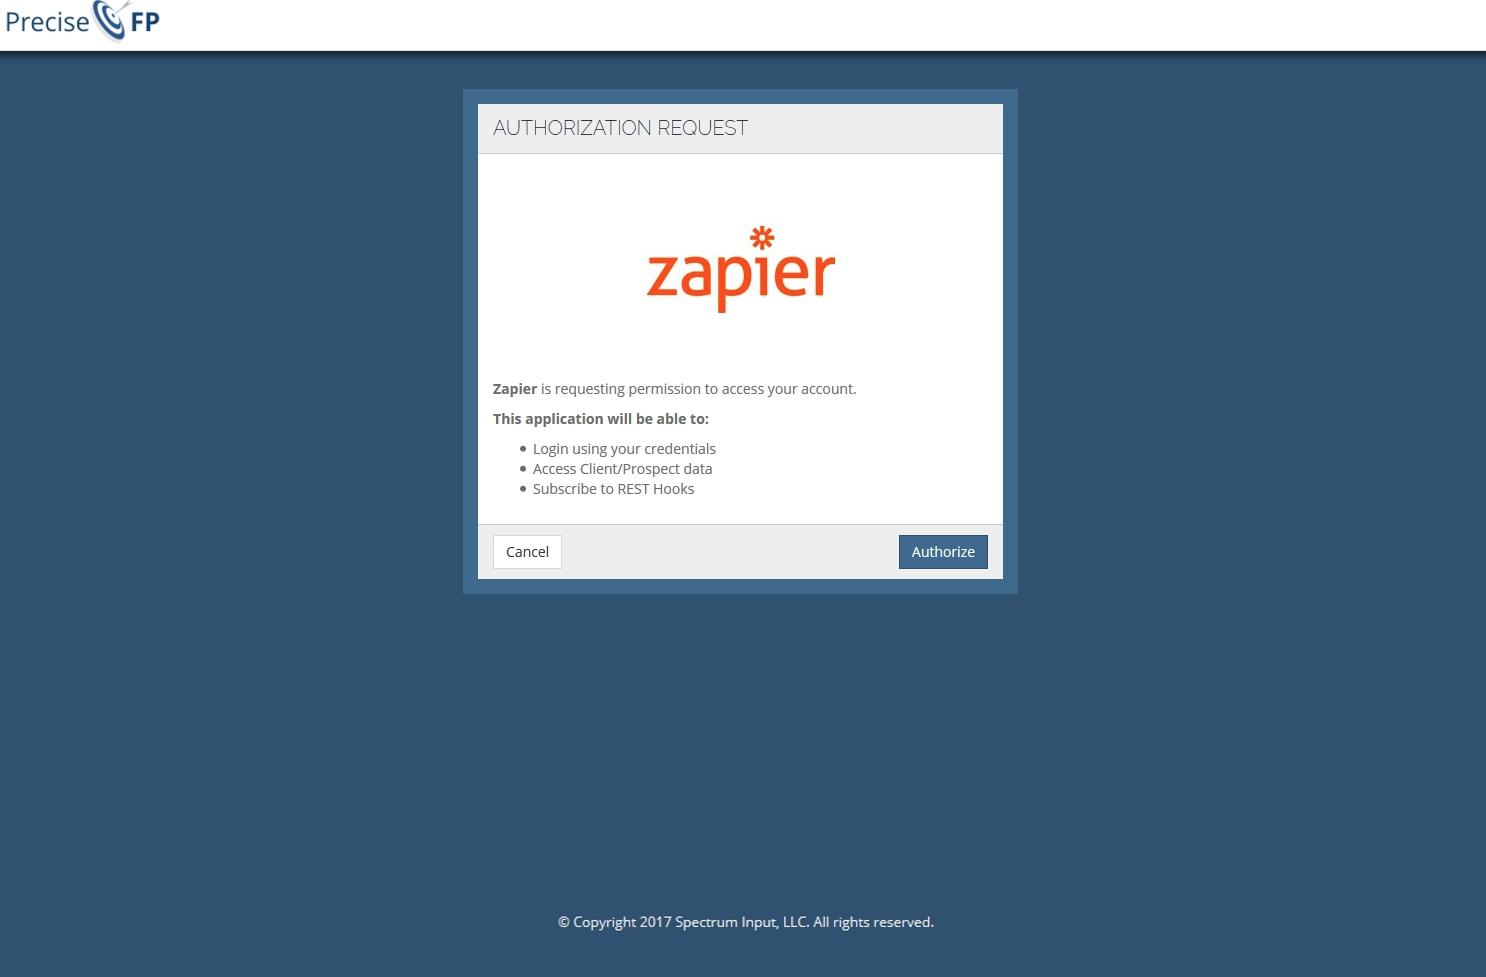 Authorize  PreciseFP on Zapier